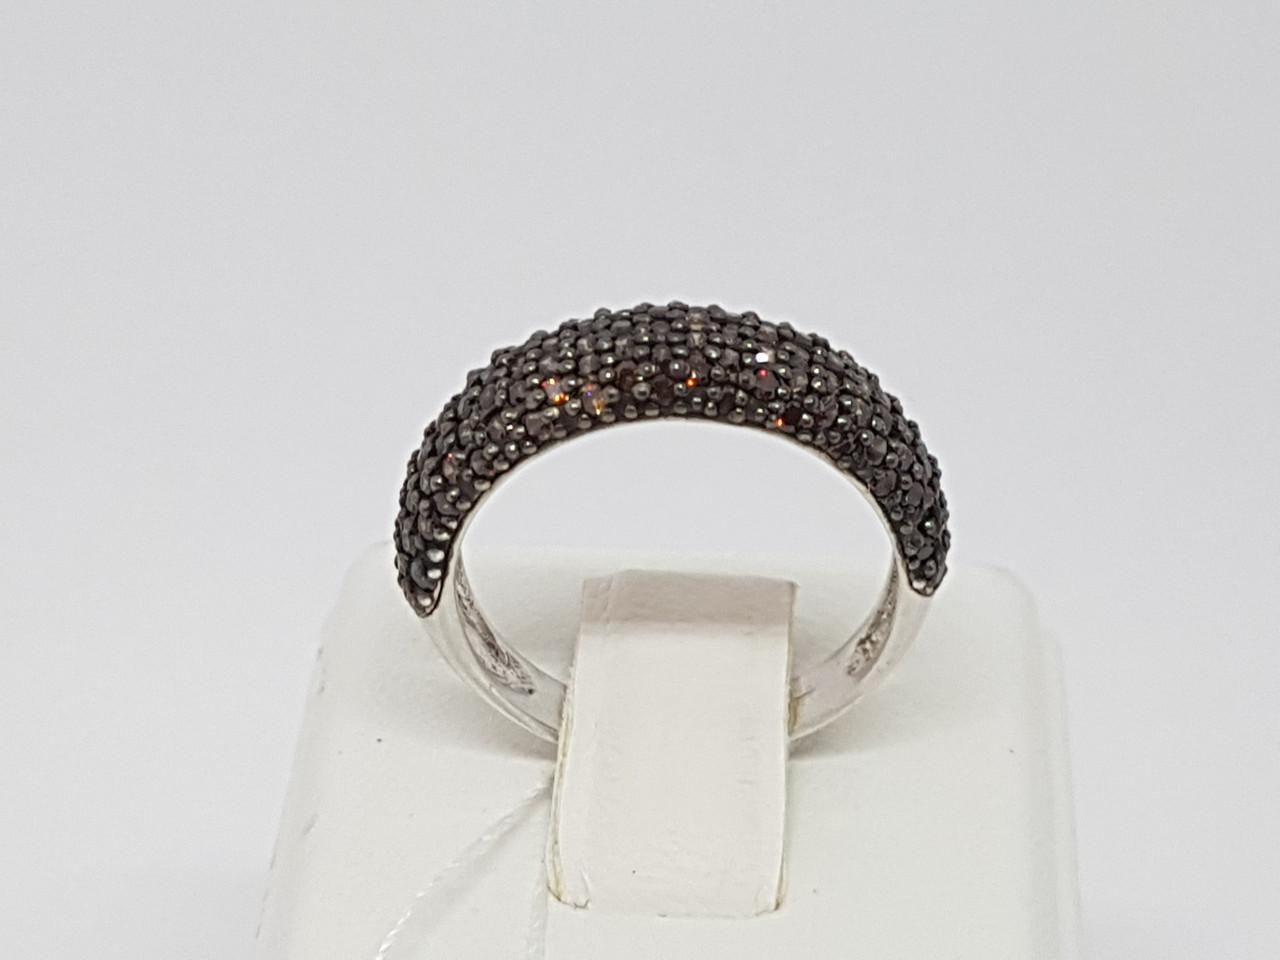 Серебряное кольцо Мерцание с фианитами. Артикул 1500/9Р-CZ